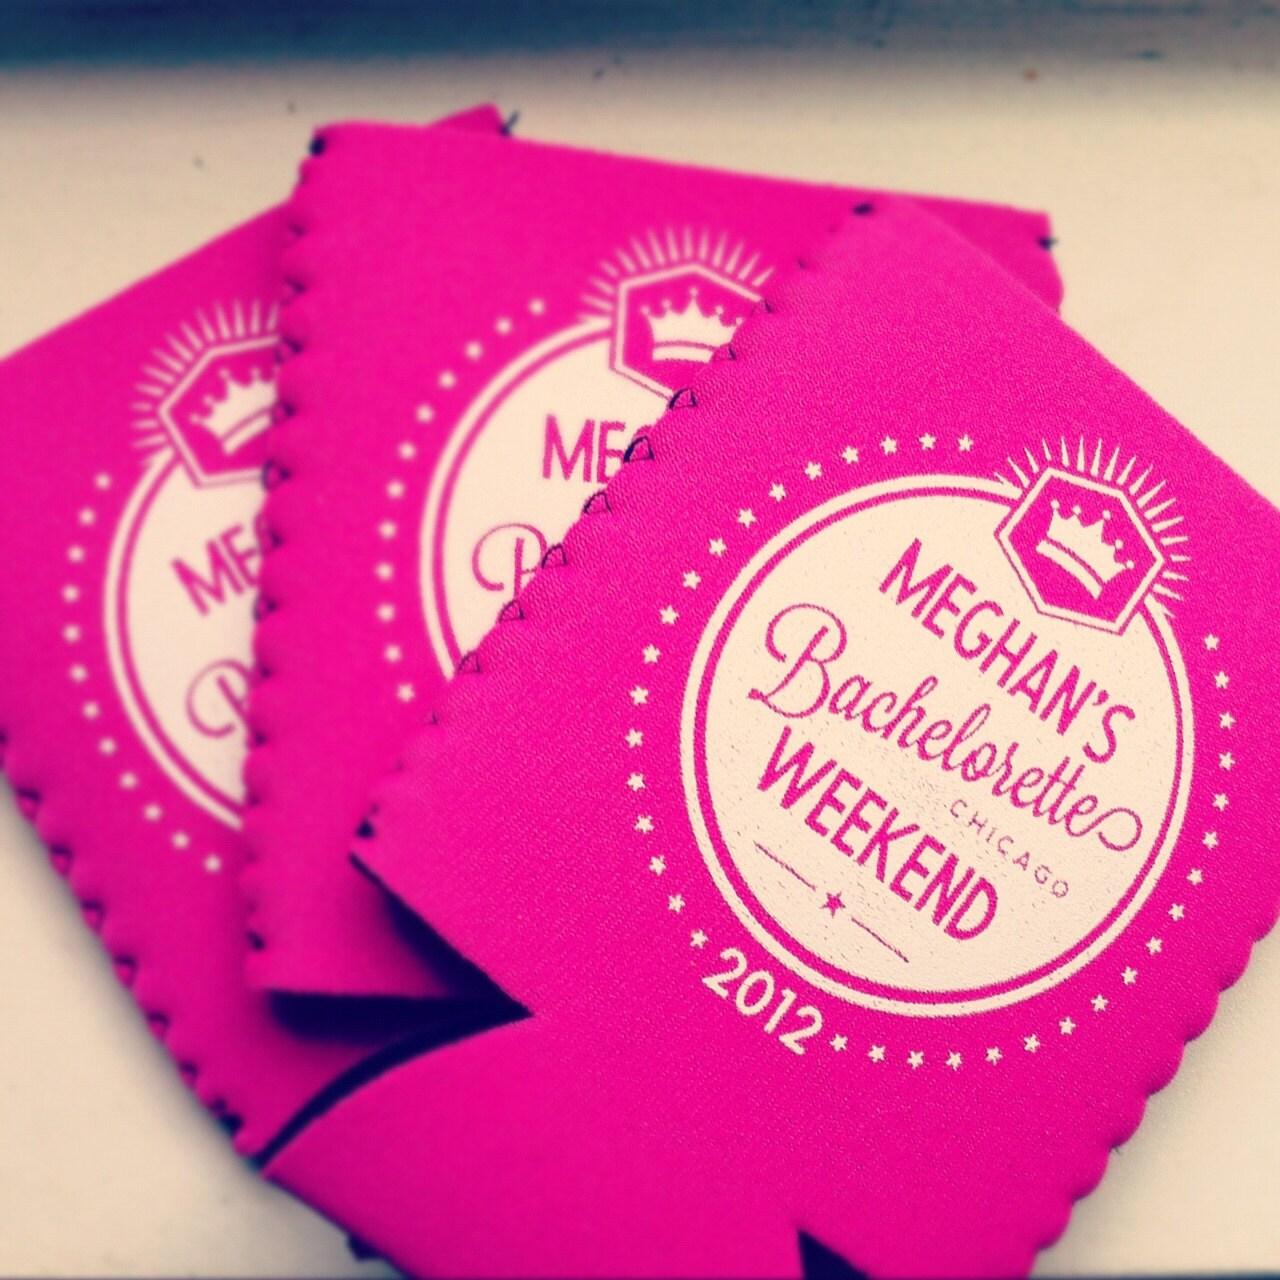 Bachelorette Party can coolers Bachelorette party favors | Etsy